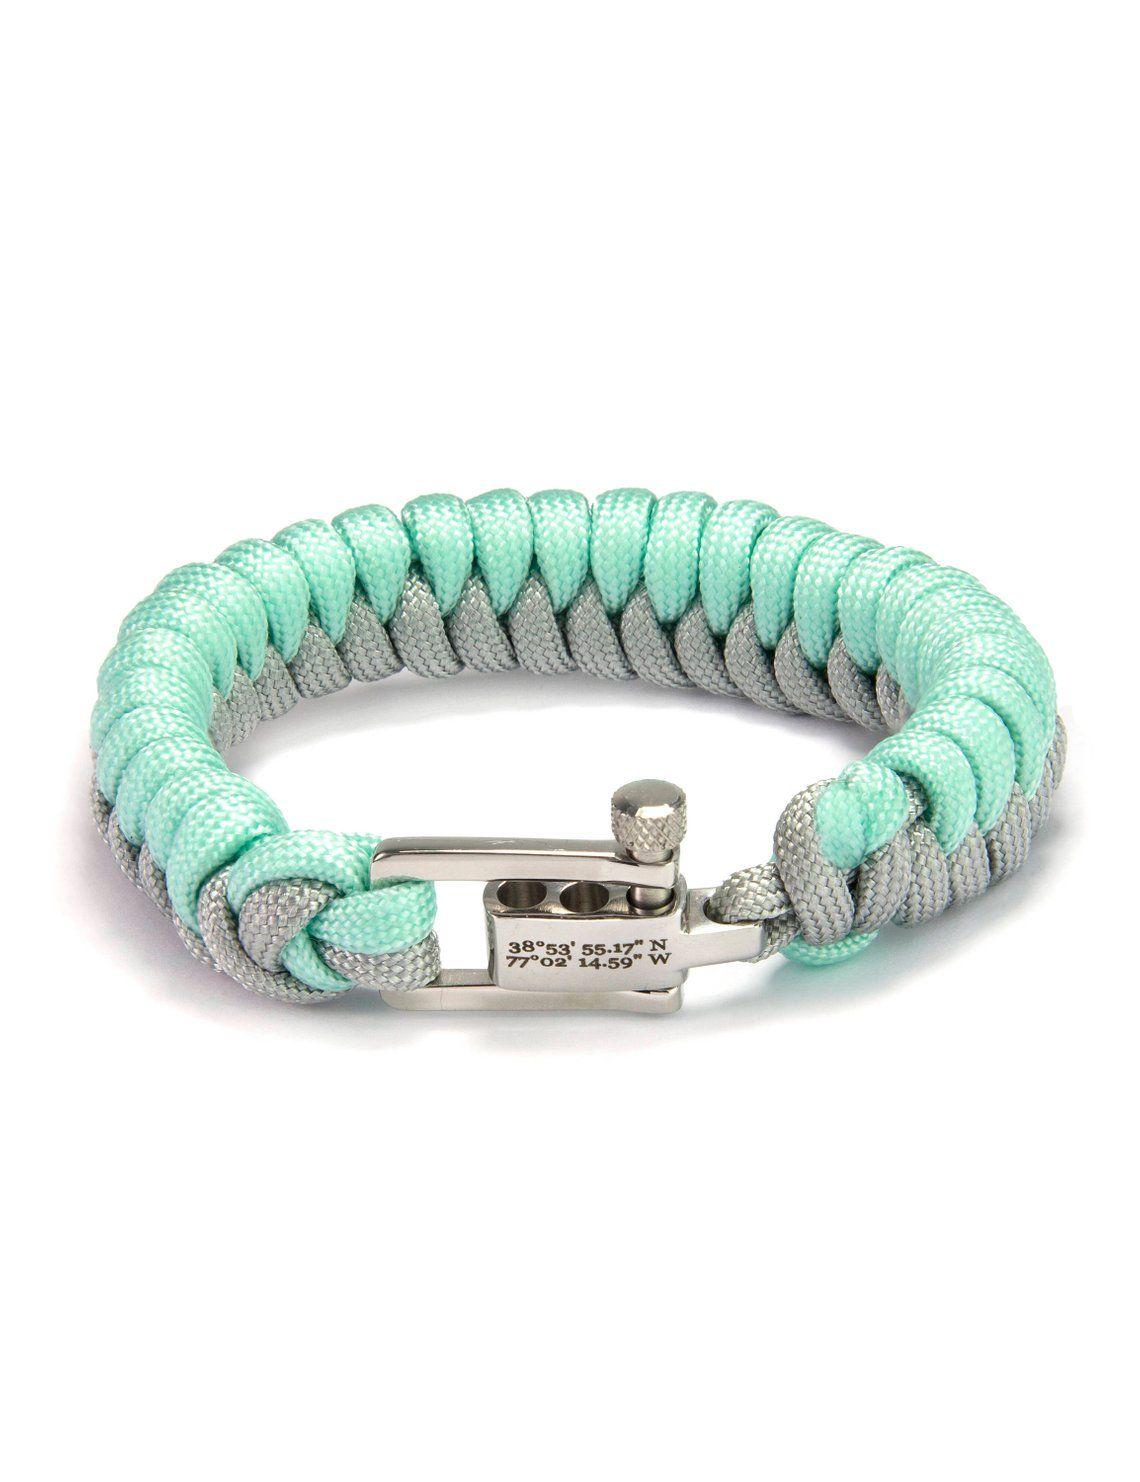 Personalized Survival Bracelet Custom Coordinate